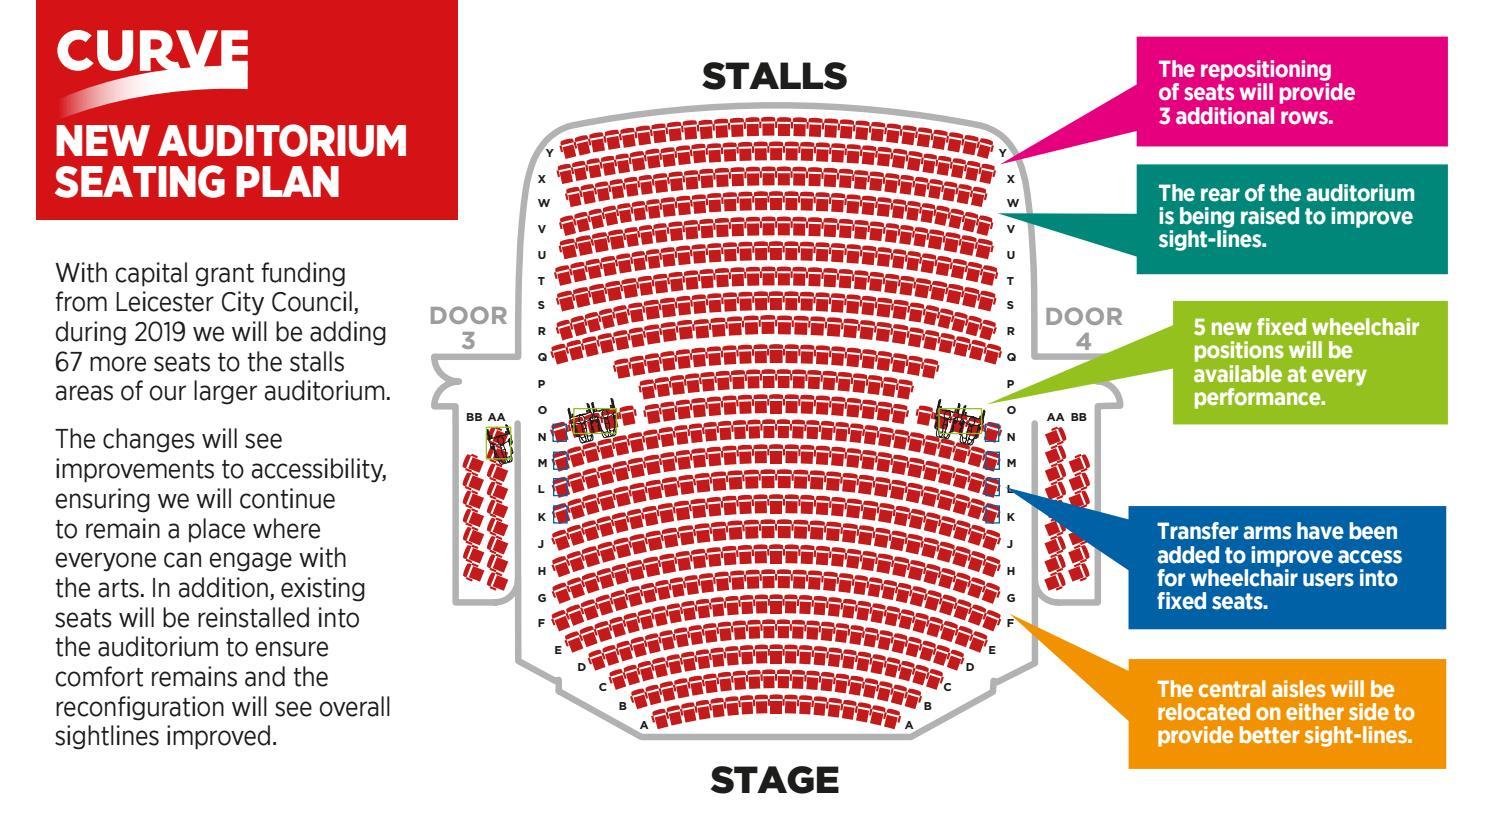 Curve | Theatre Auditorium Seating Plan 2019 by Curve